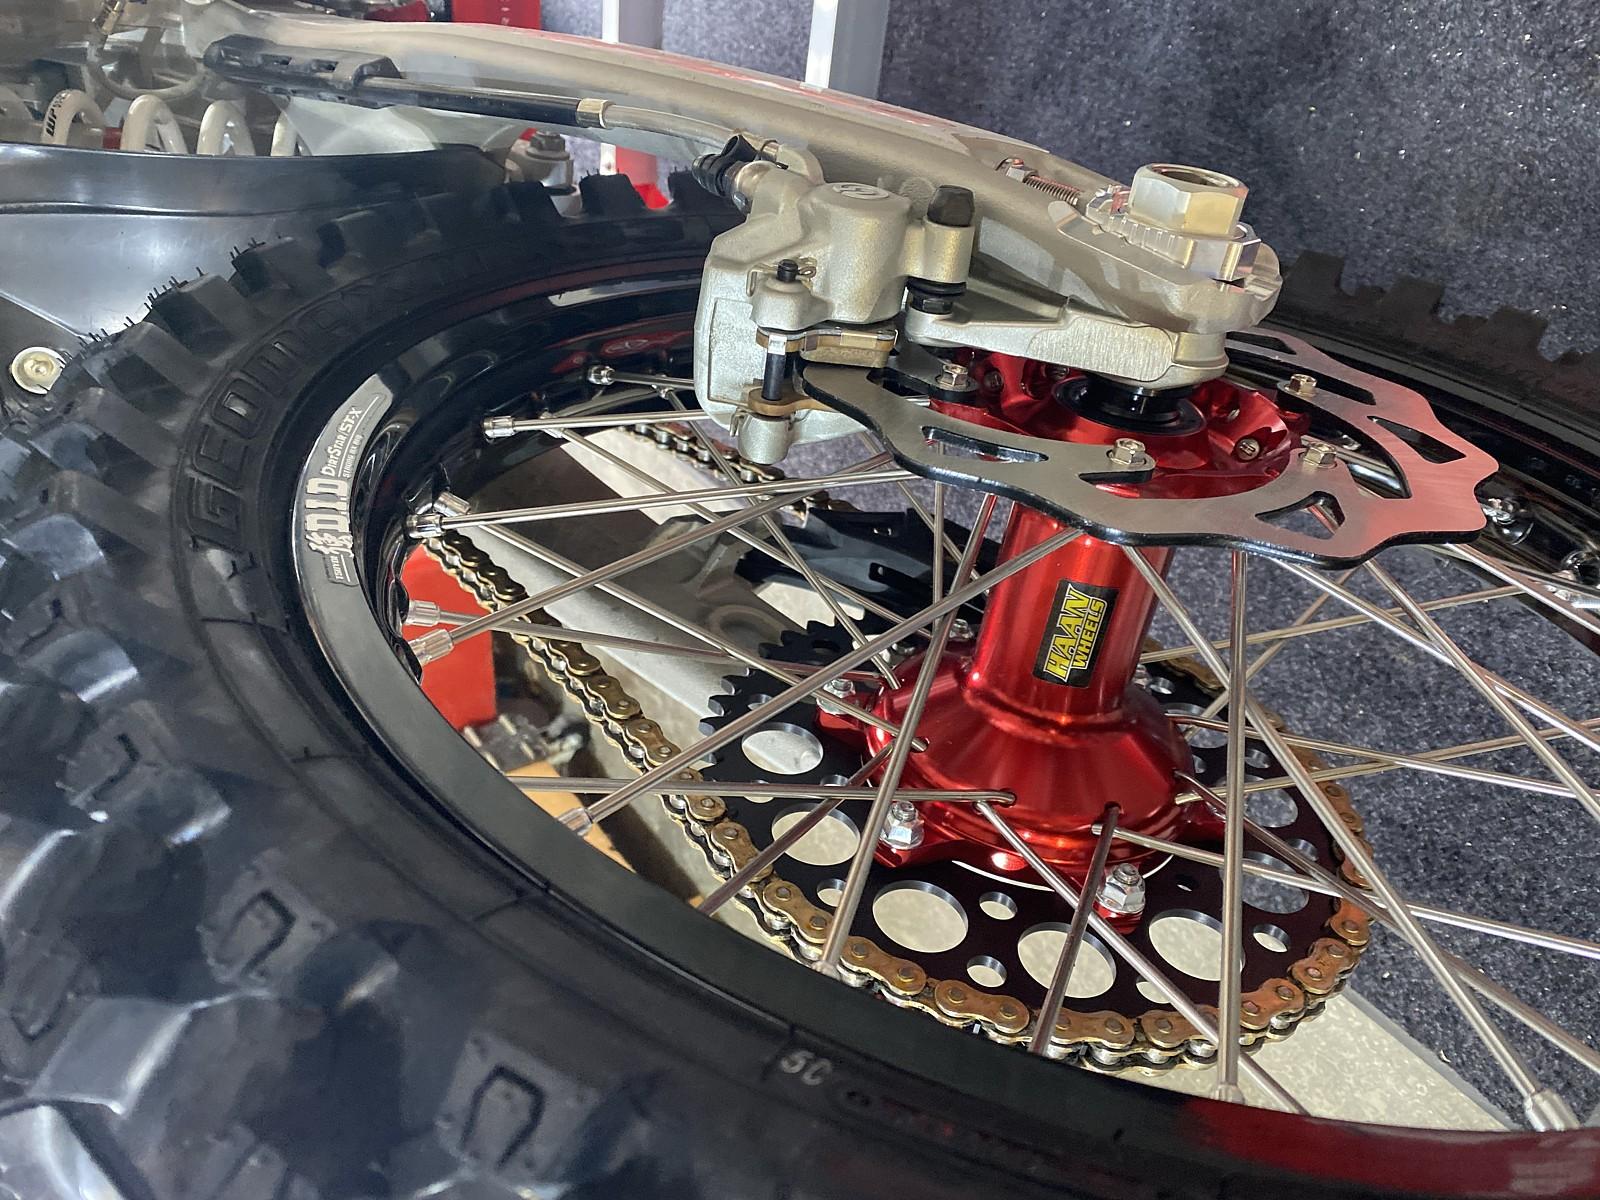 New rear wheel - prida28 - Motocross Pictures - Vital MX